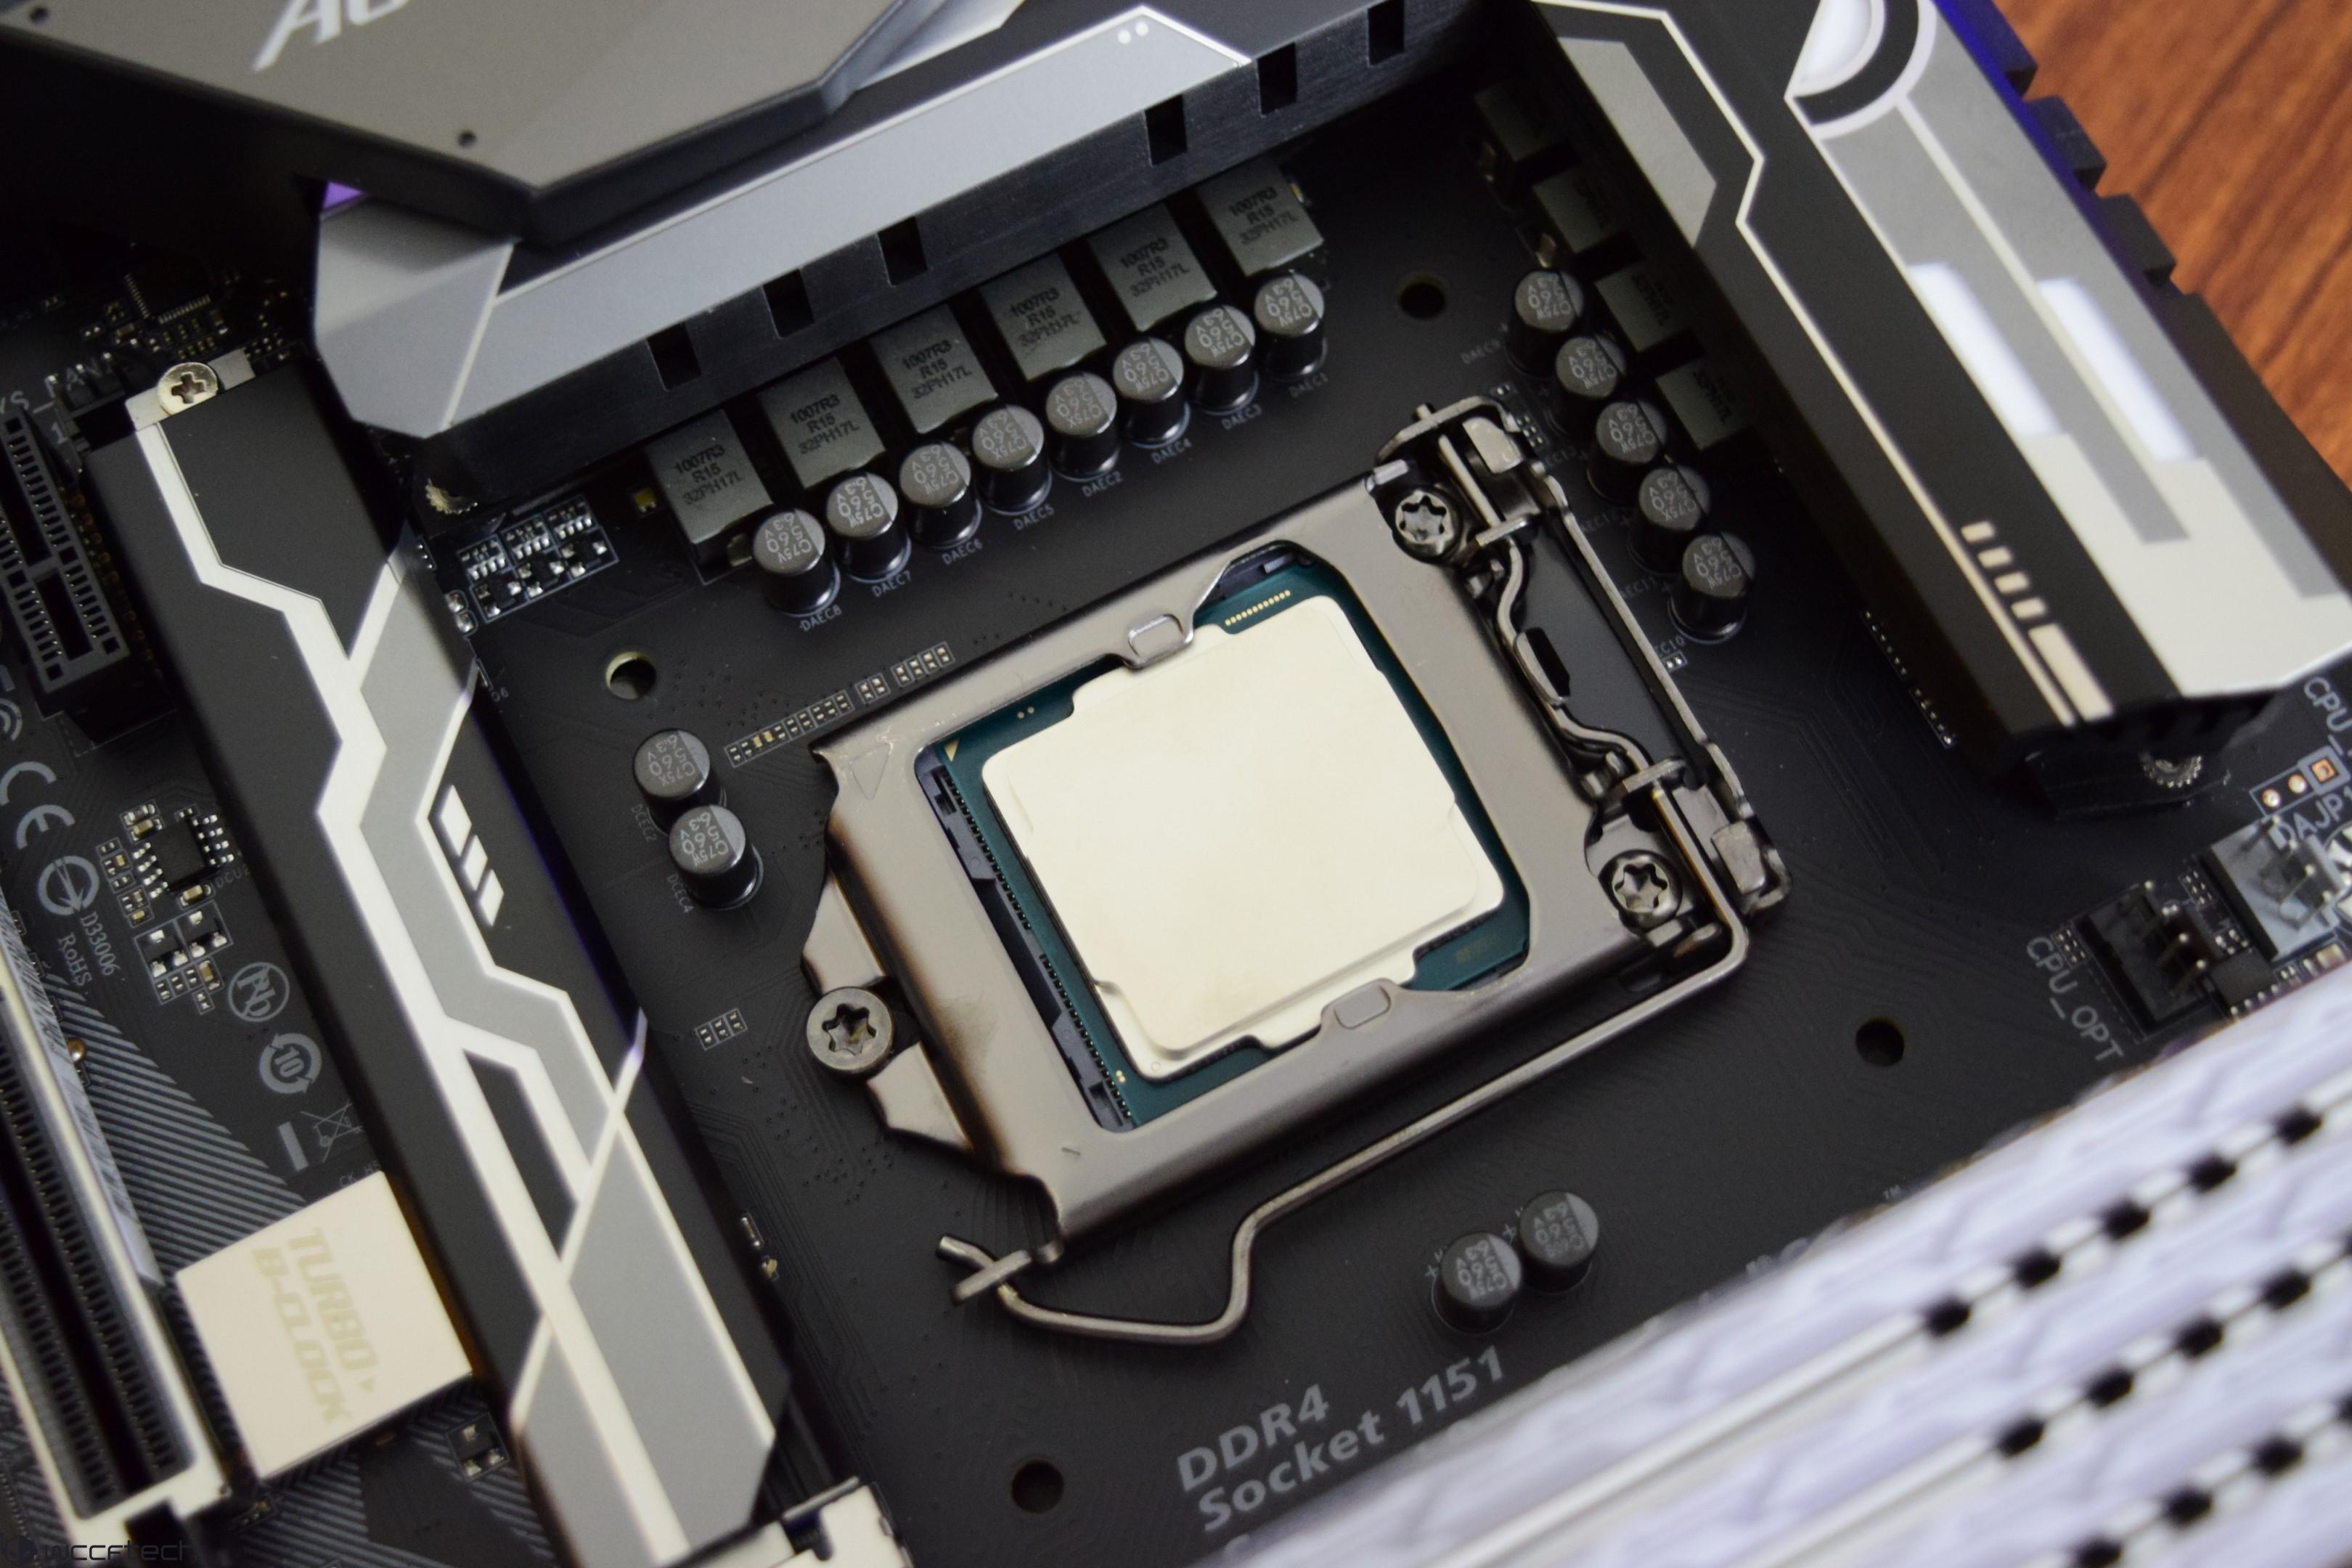 Intel Core i9-9900K, i7-9700K, i5-9600K CPU Performance